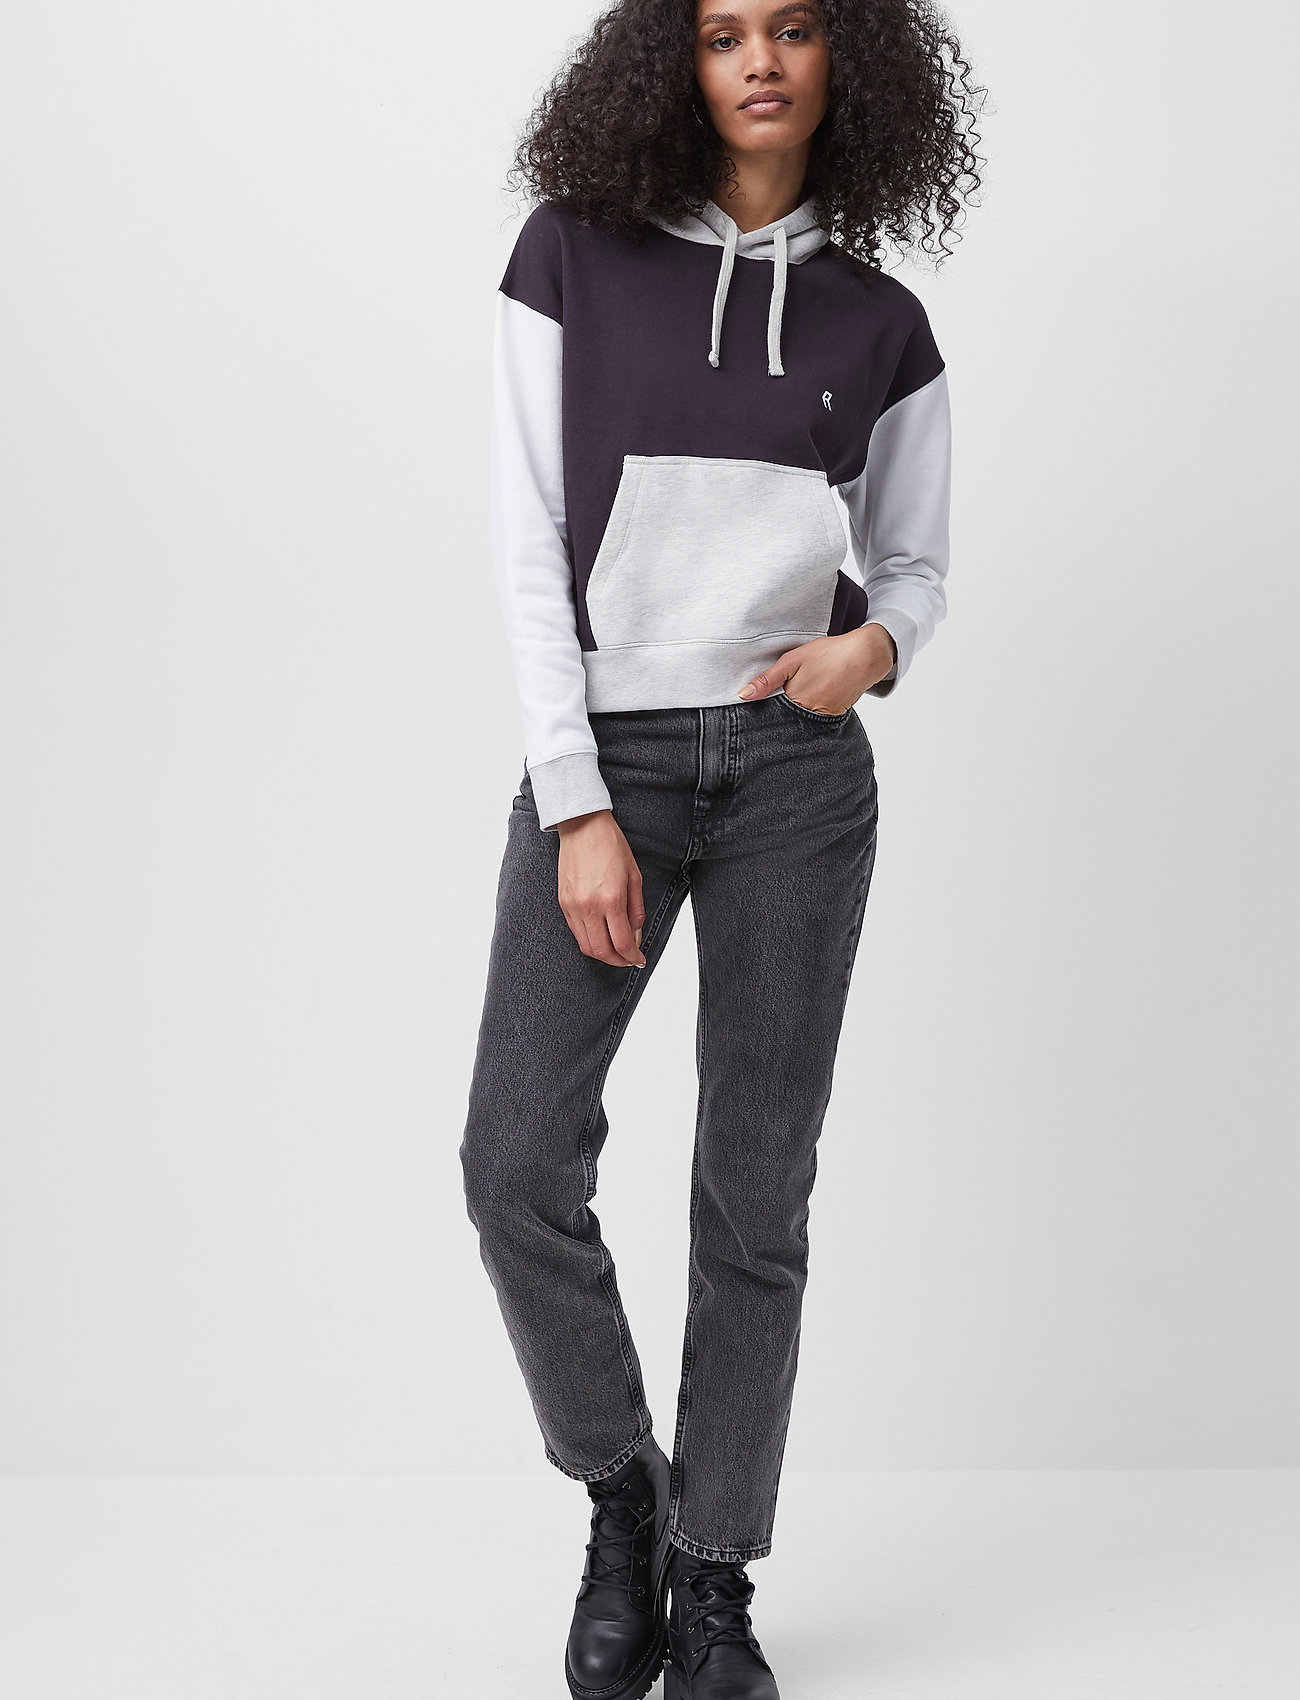 French Connection - PANDORAH ORD DEN CIGRETTE JEAN - slim jeans - washed grey - 0